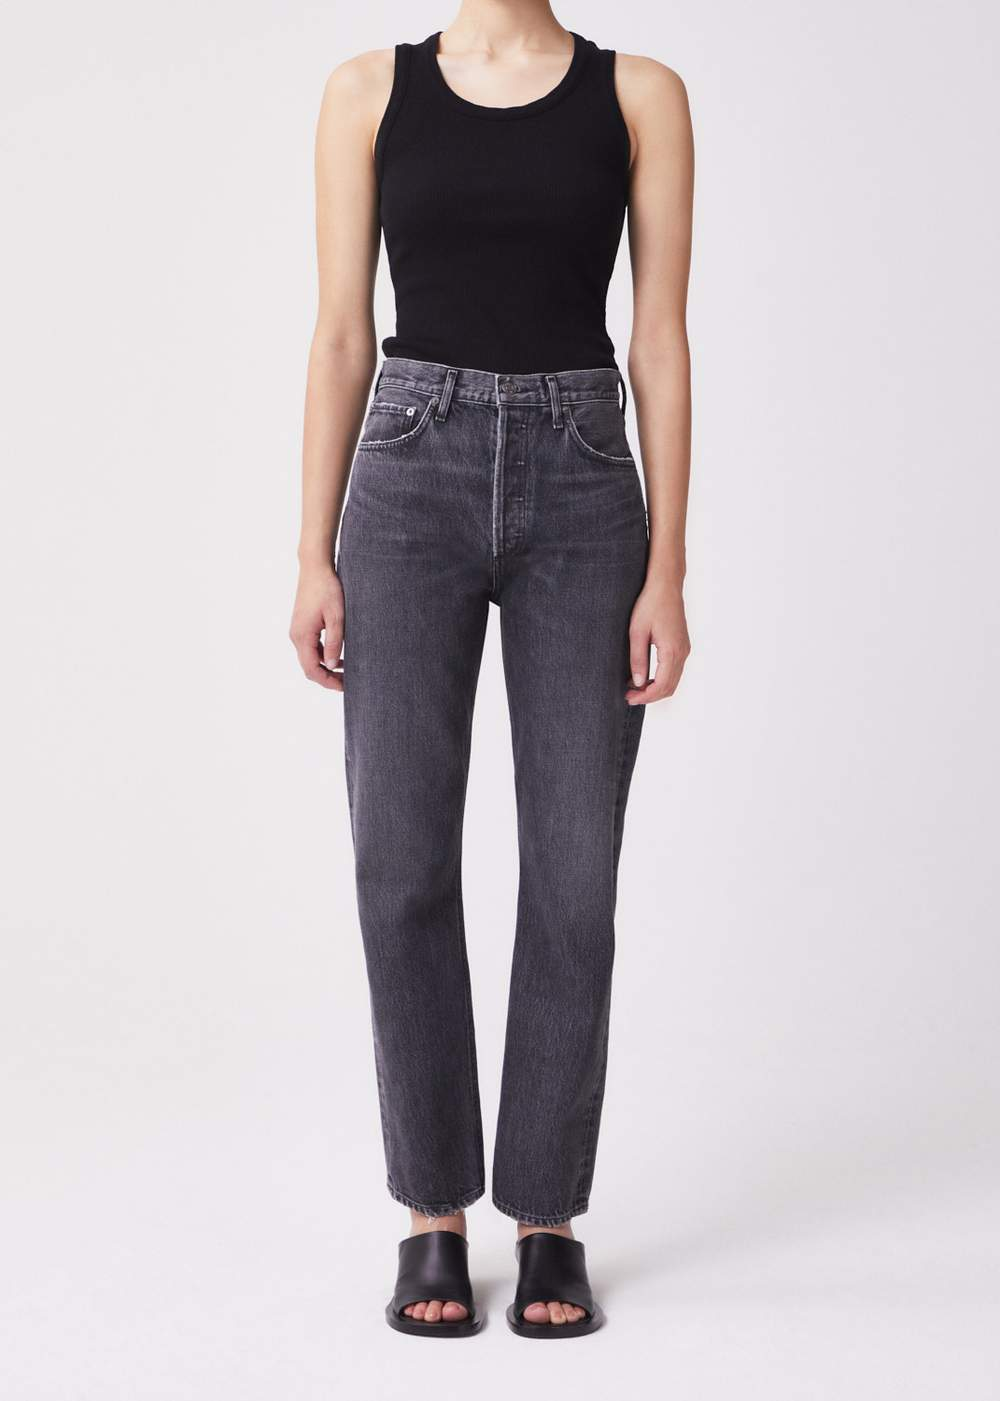 Jeans, 90s pinch, Agolde, grey washed denim